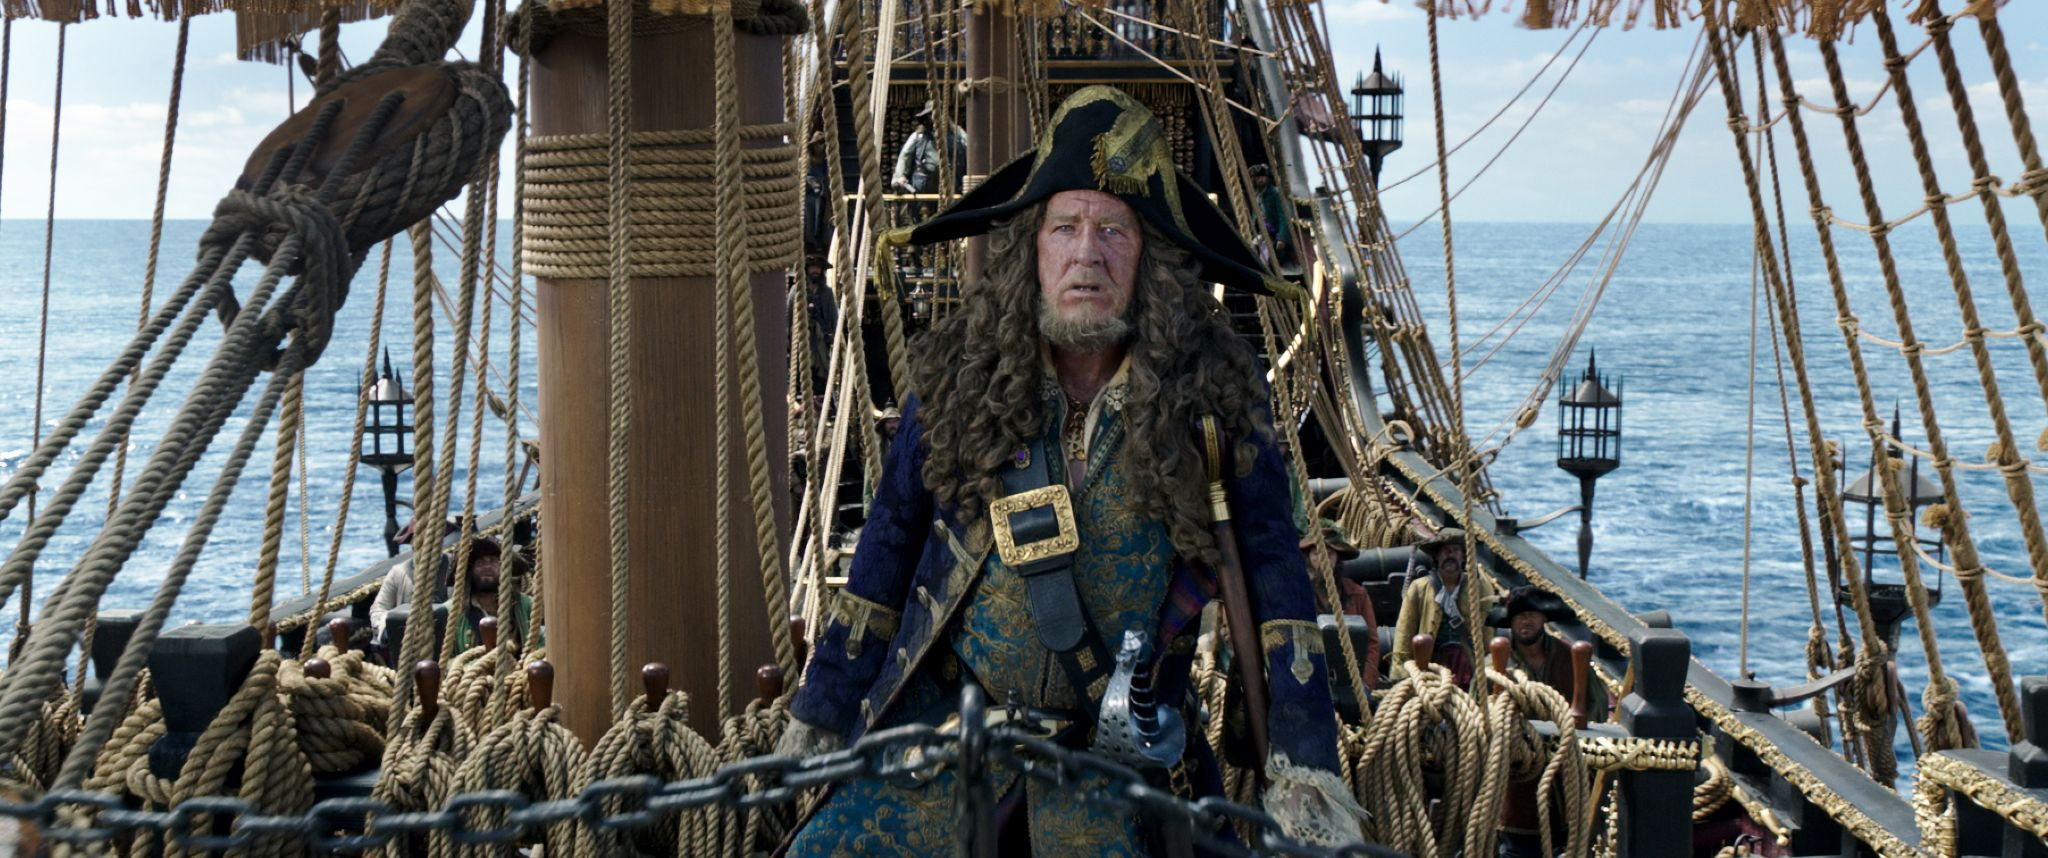 Caribbean Men: Pirates Of The Caribbean: New Trailer Hits The High Seas